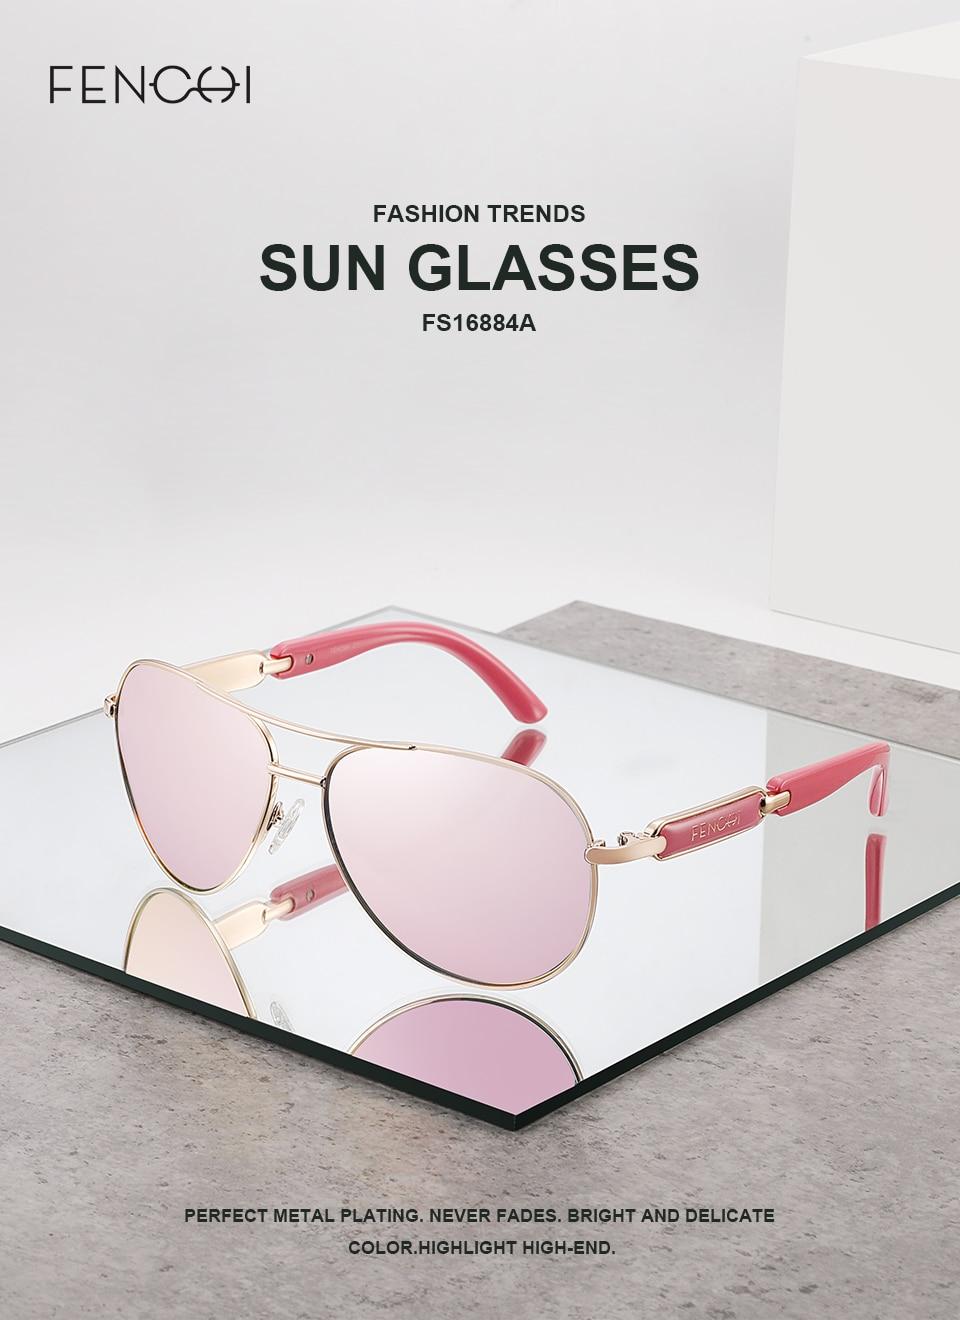 Hfe9aaa99f8ae43c989c9229c1edd2c091 FENCHI Polarized Sunglasses Women Vintage Brand Glasses Driving Pilot Pink Mirror sunglasses Men ladies oculos de sol feminino